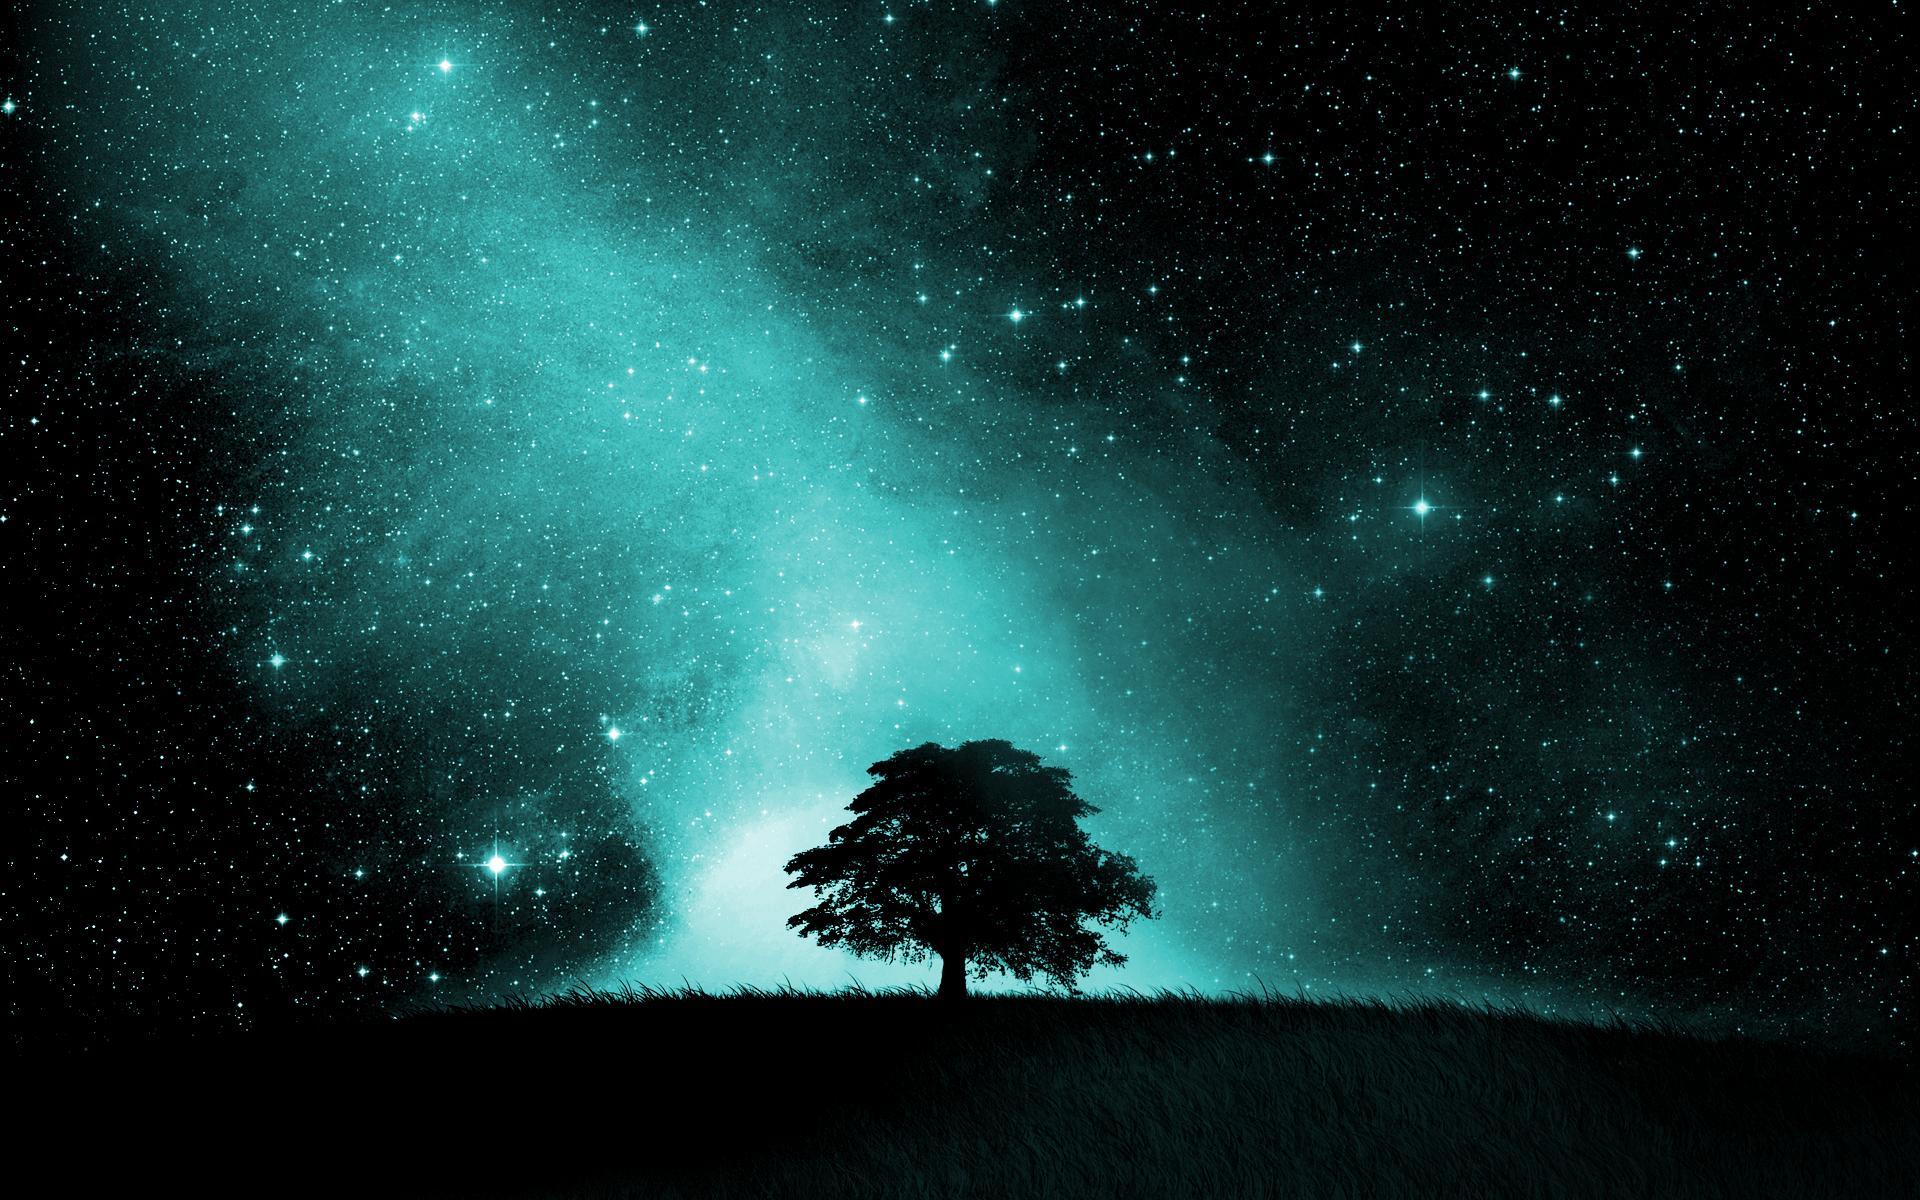 Starry Night Sky Computer Wallpapers, Desktop Backgrounds  1920x1200  ID:71...